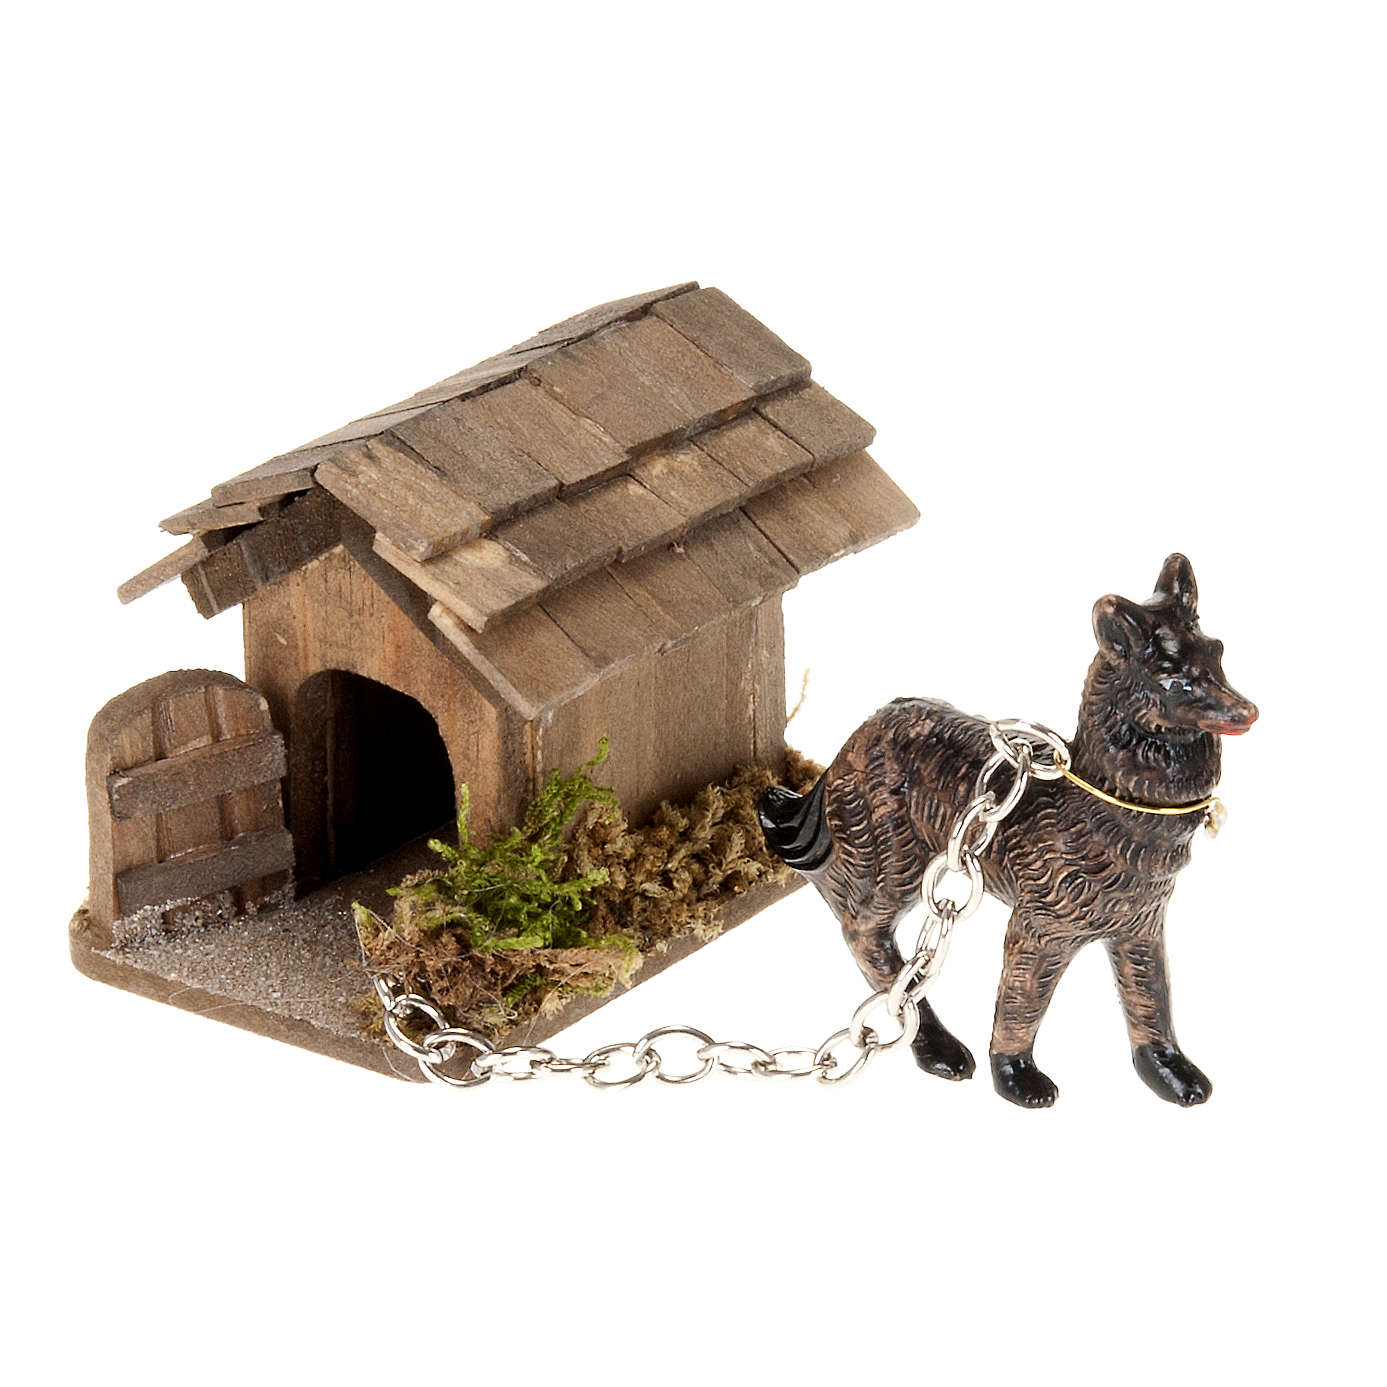 Nativity scene figurines, guard dog 10cm 3